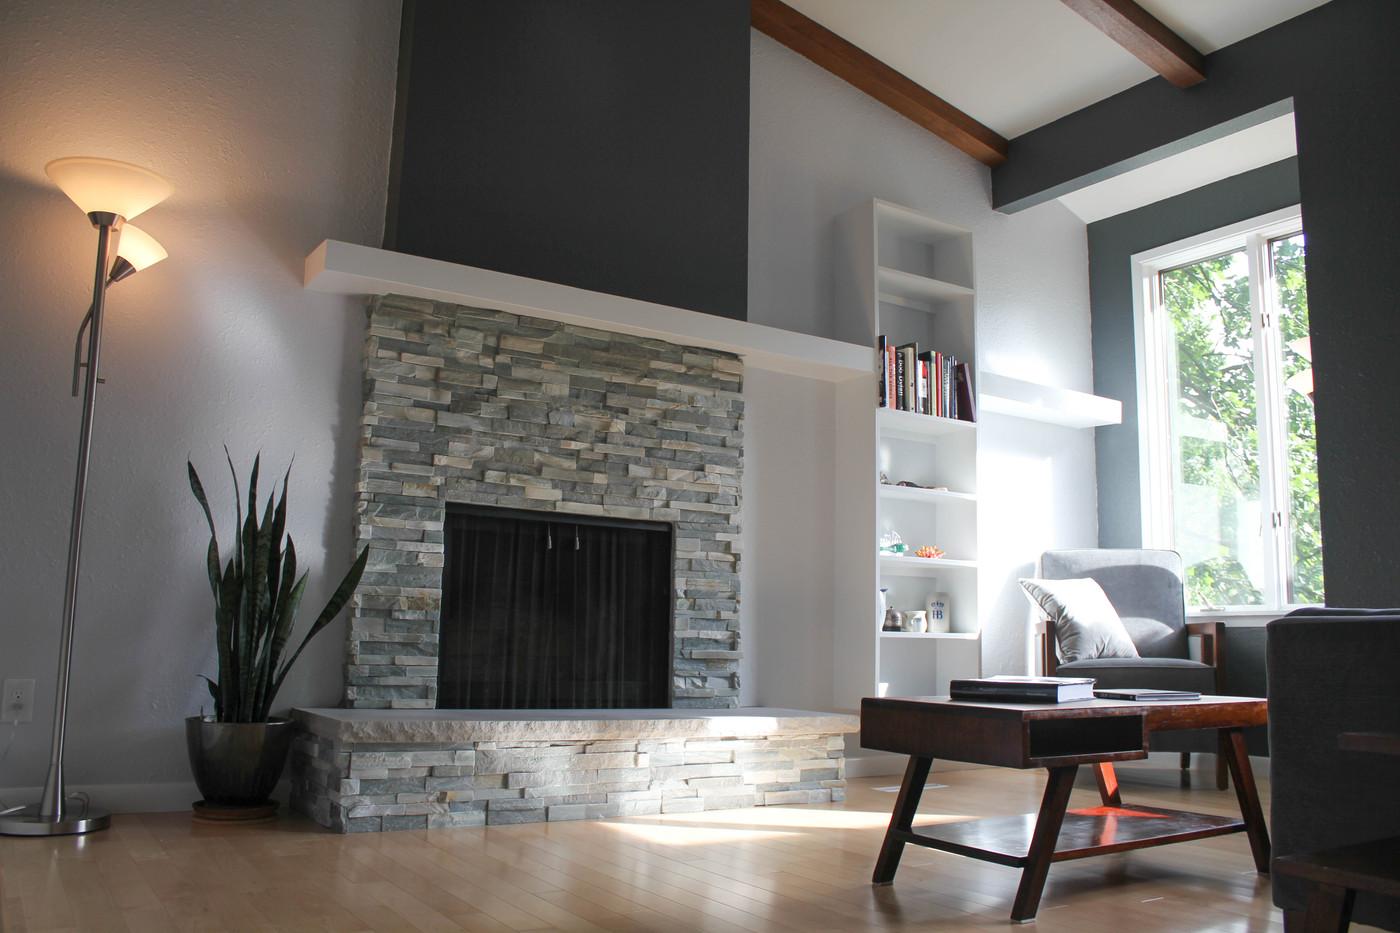 14 A_Fireplace.jpg